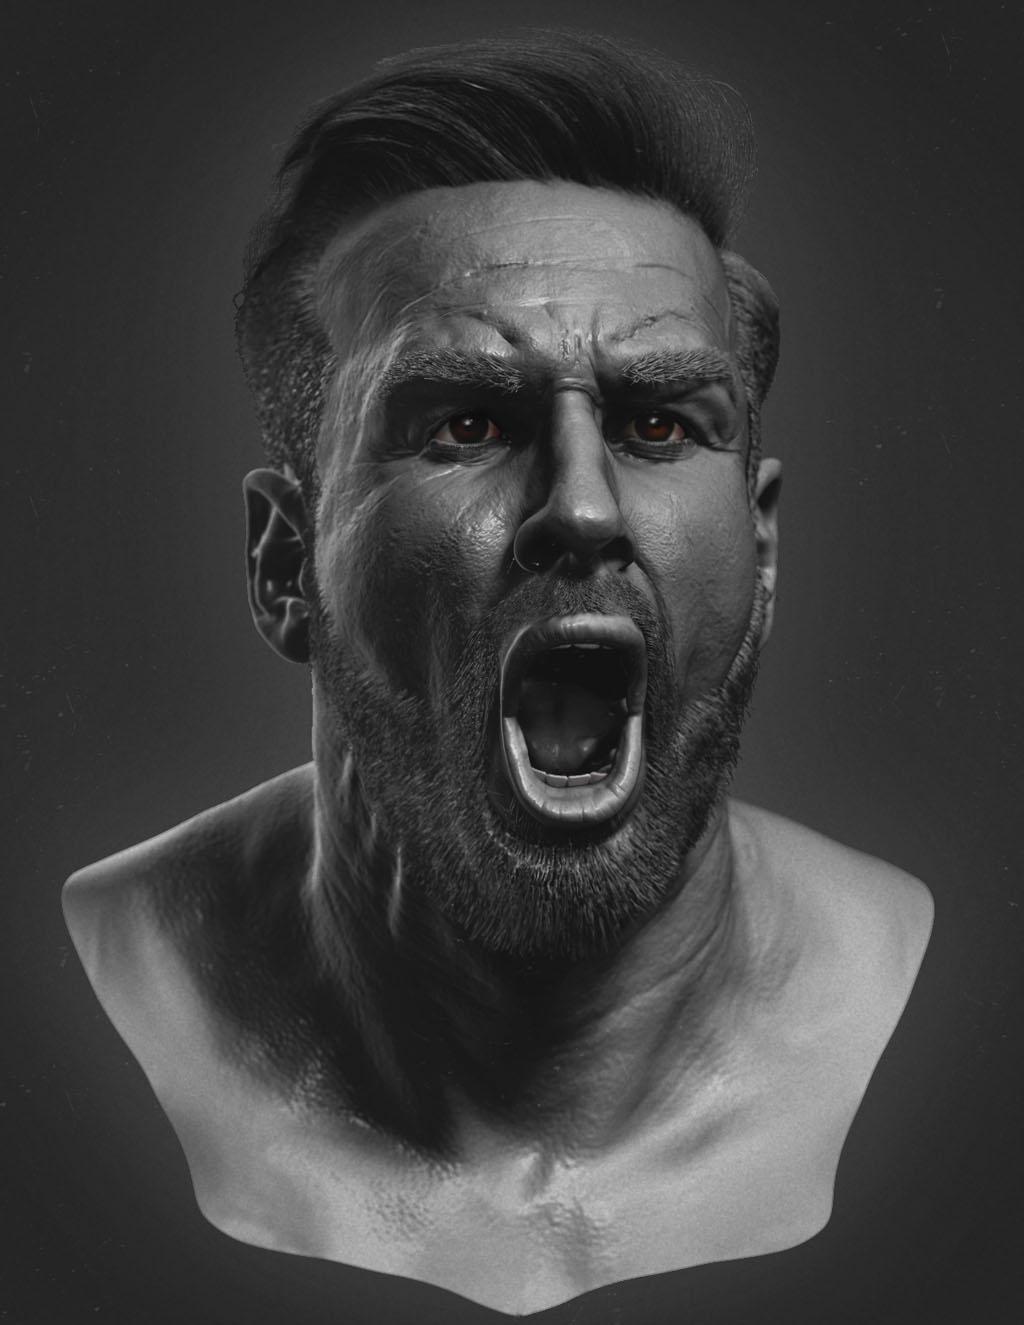 zbrush model face man by gaurav kumar